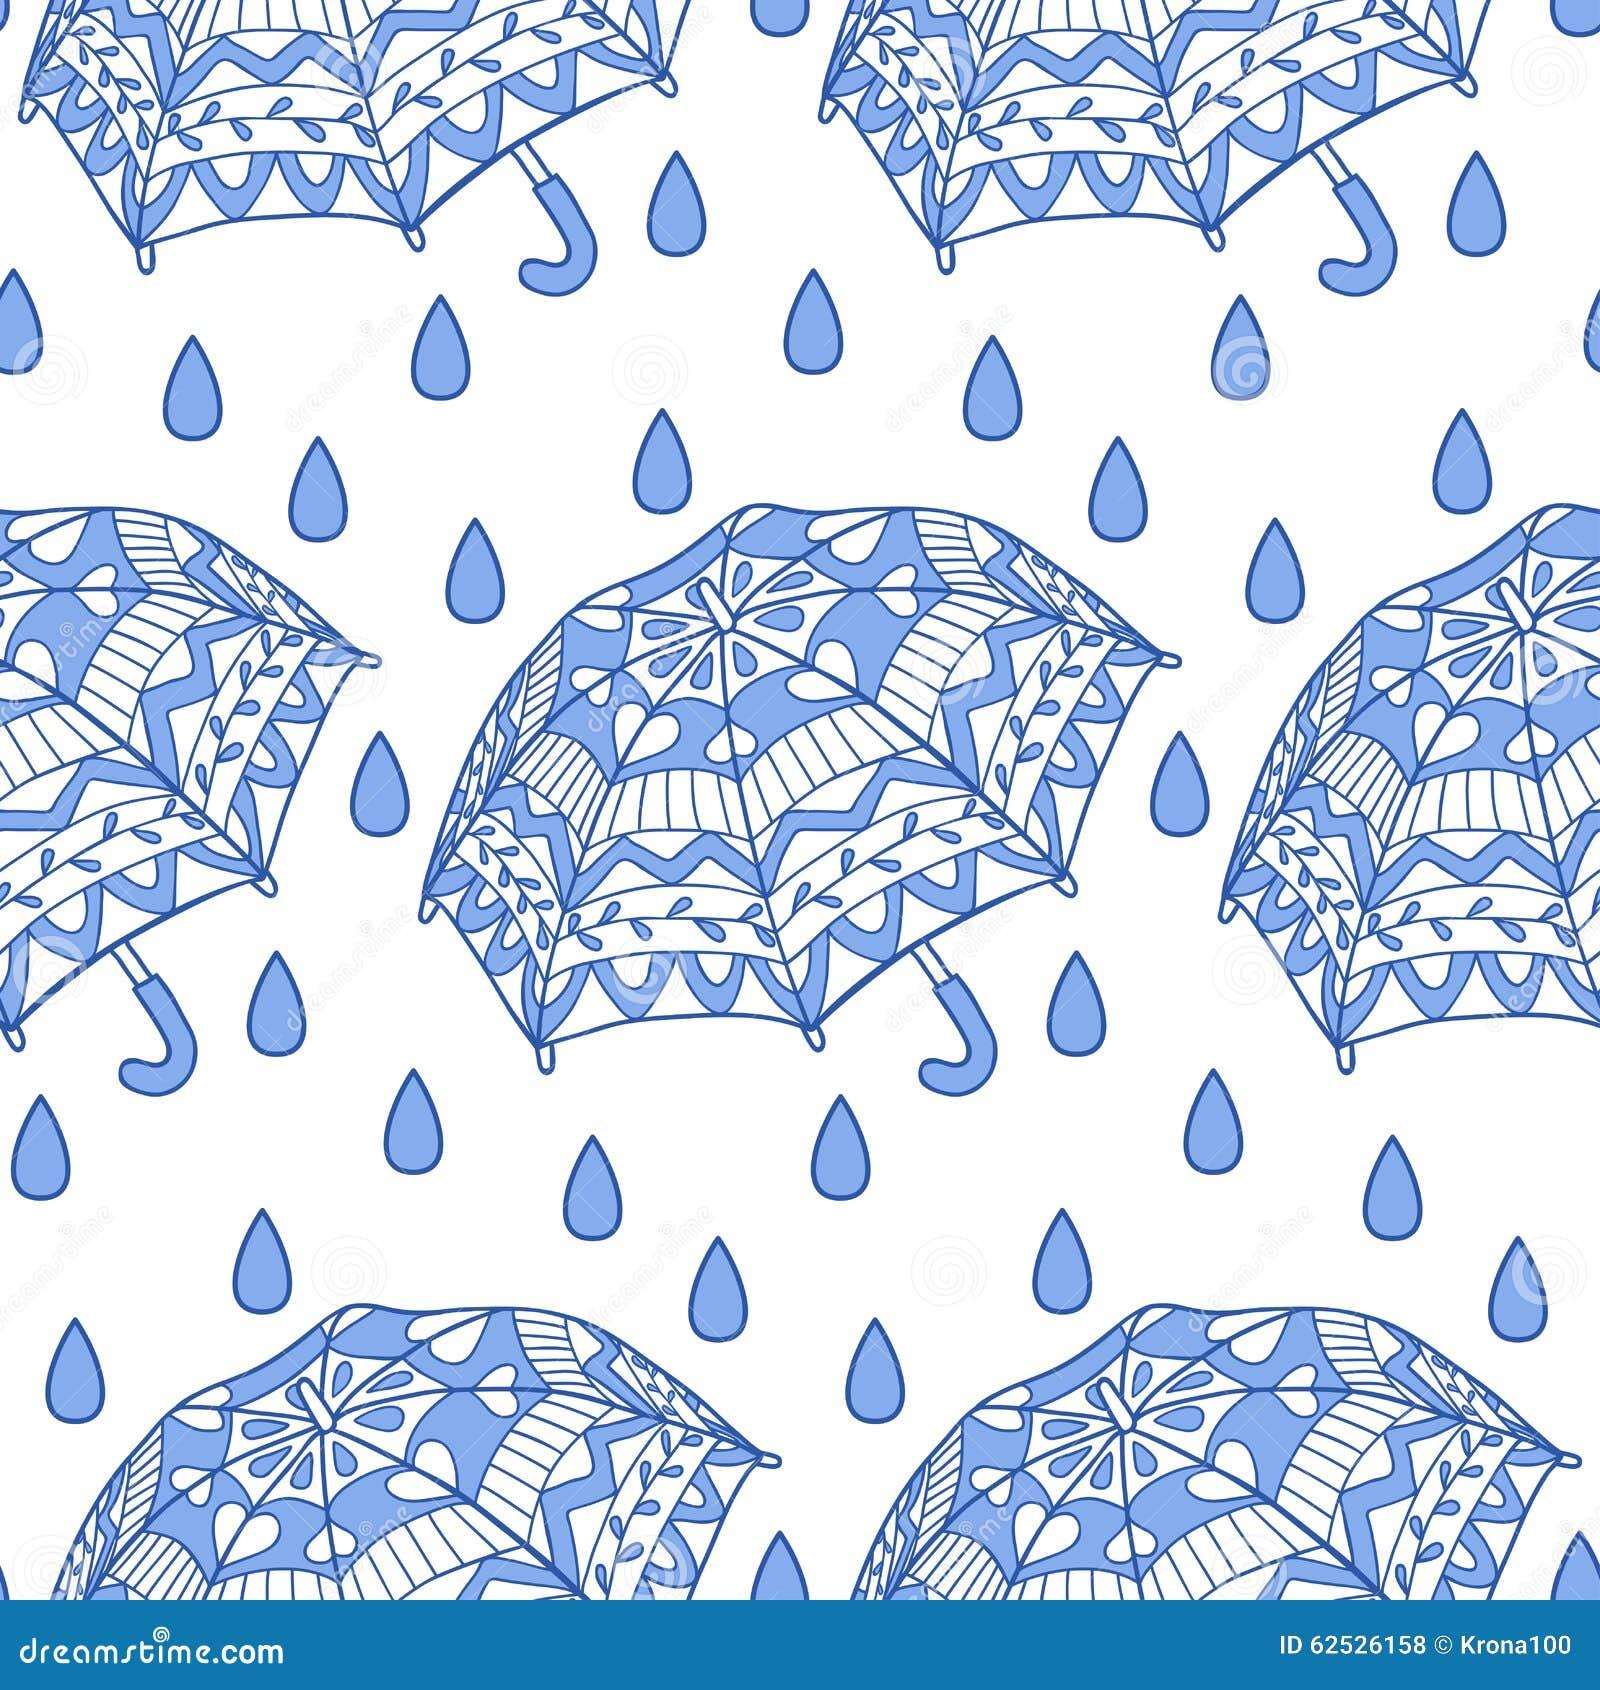 Seamless Pattern With Ornamental Umbrellas And Rain